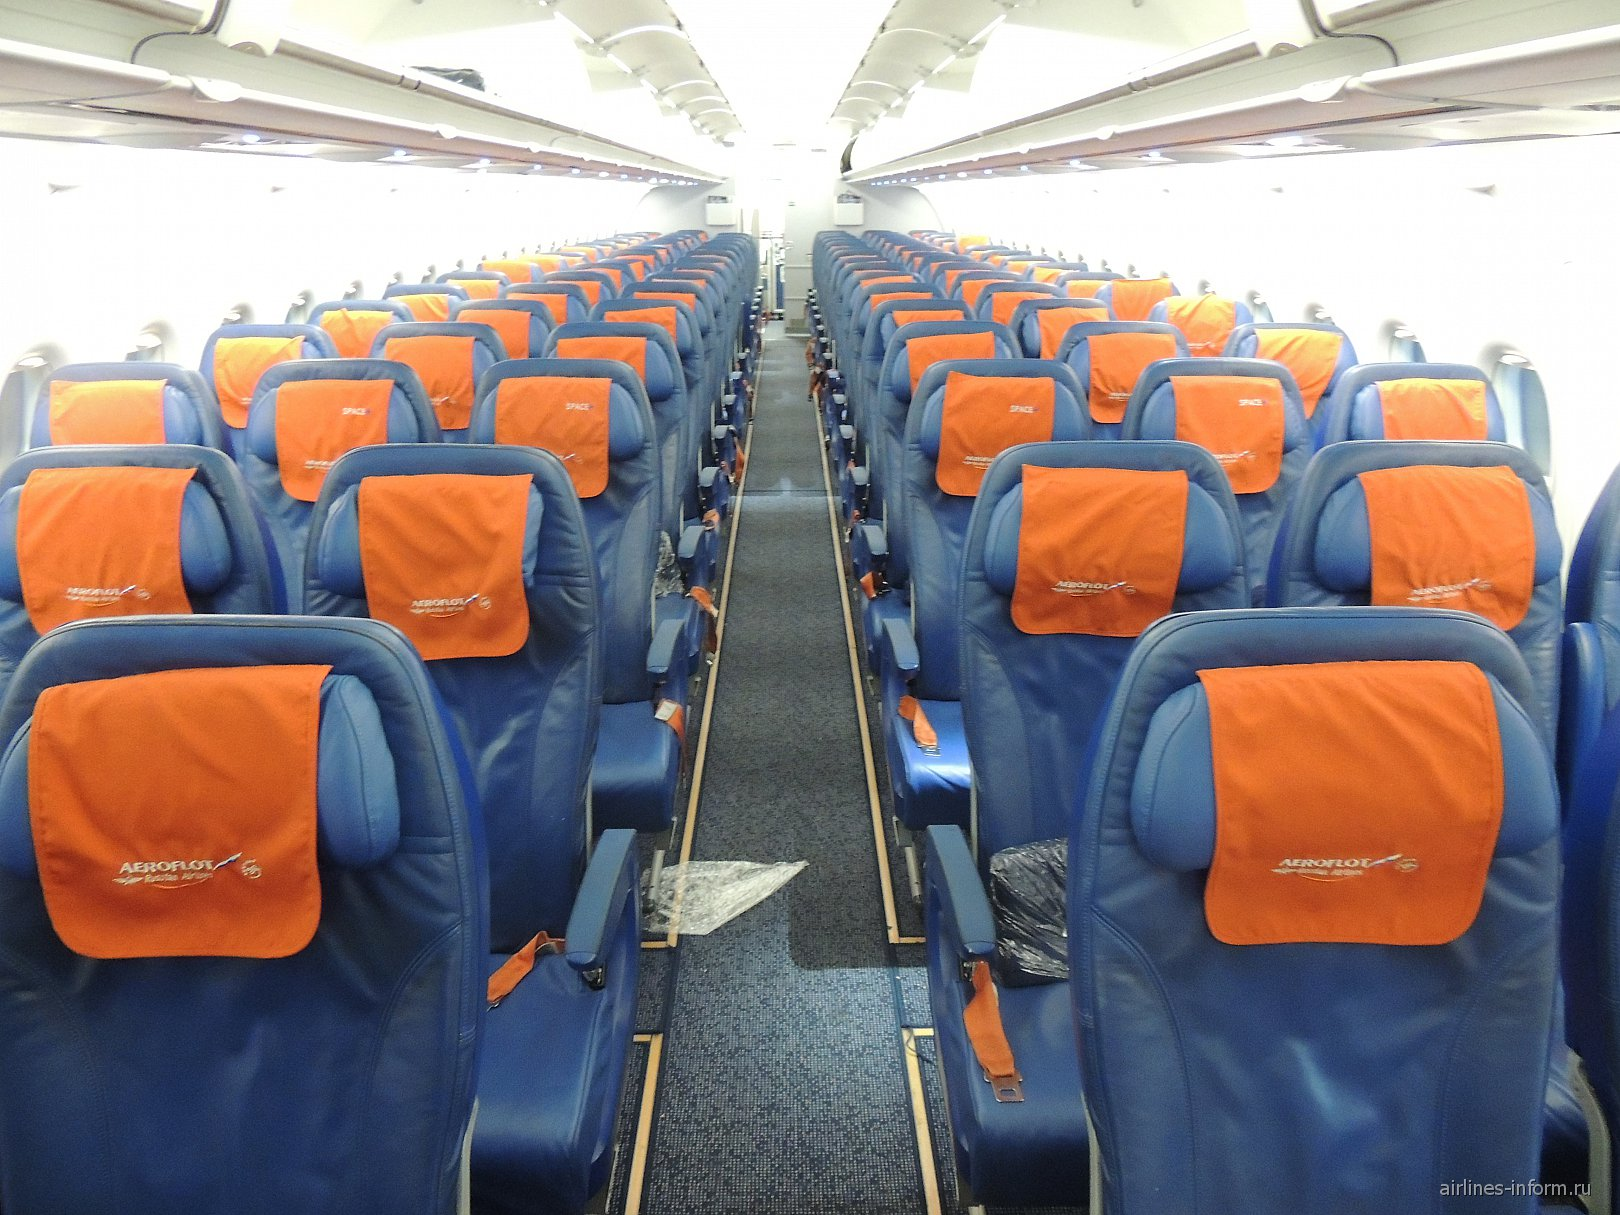 Салон самолета Airbus A319 авиакомпании Аэрофлот